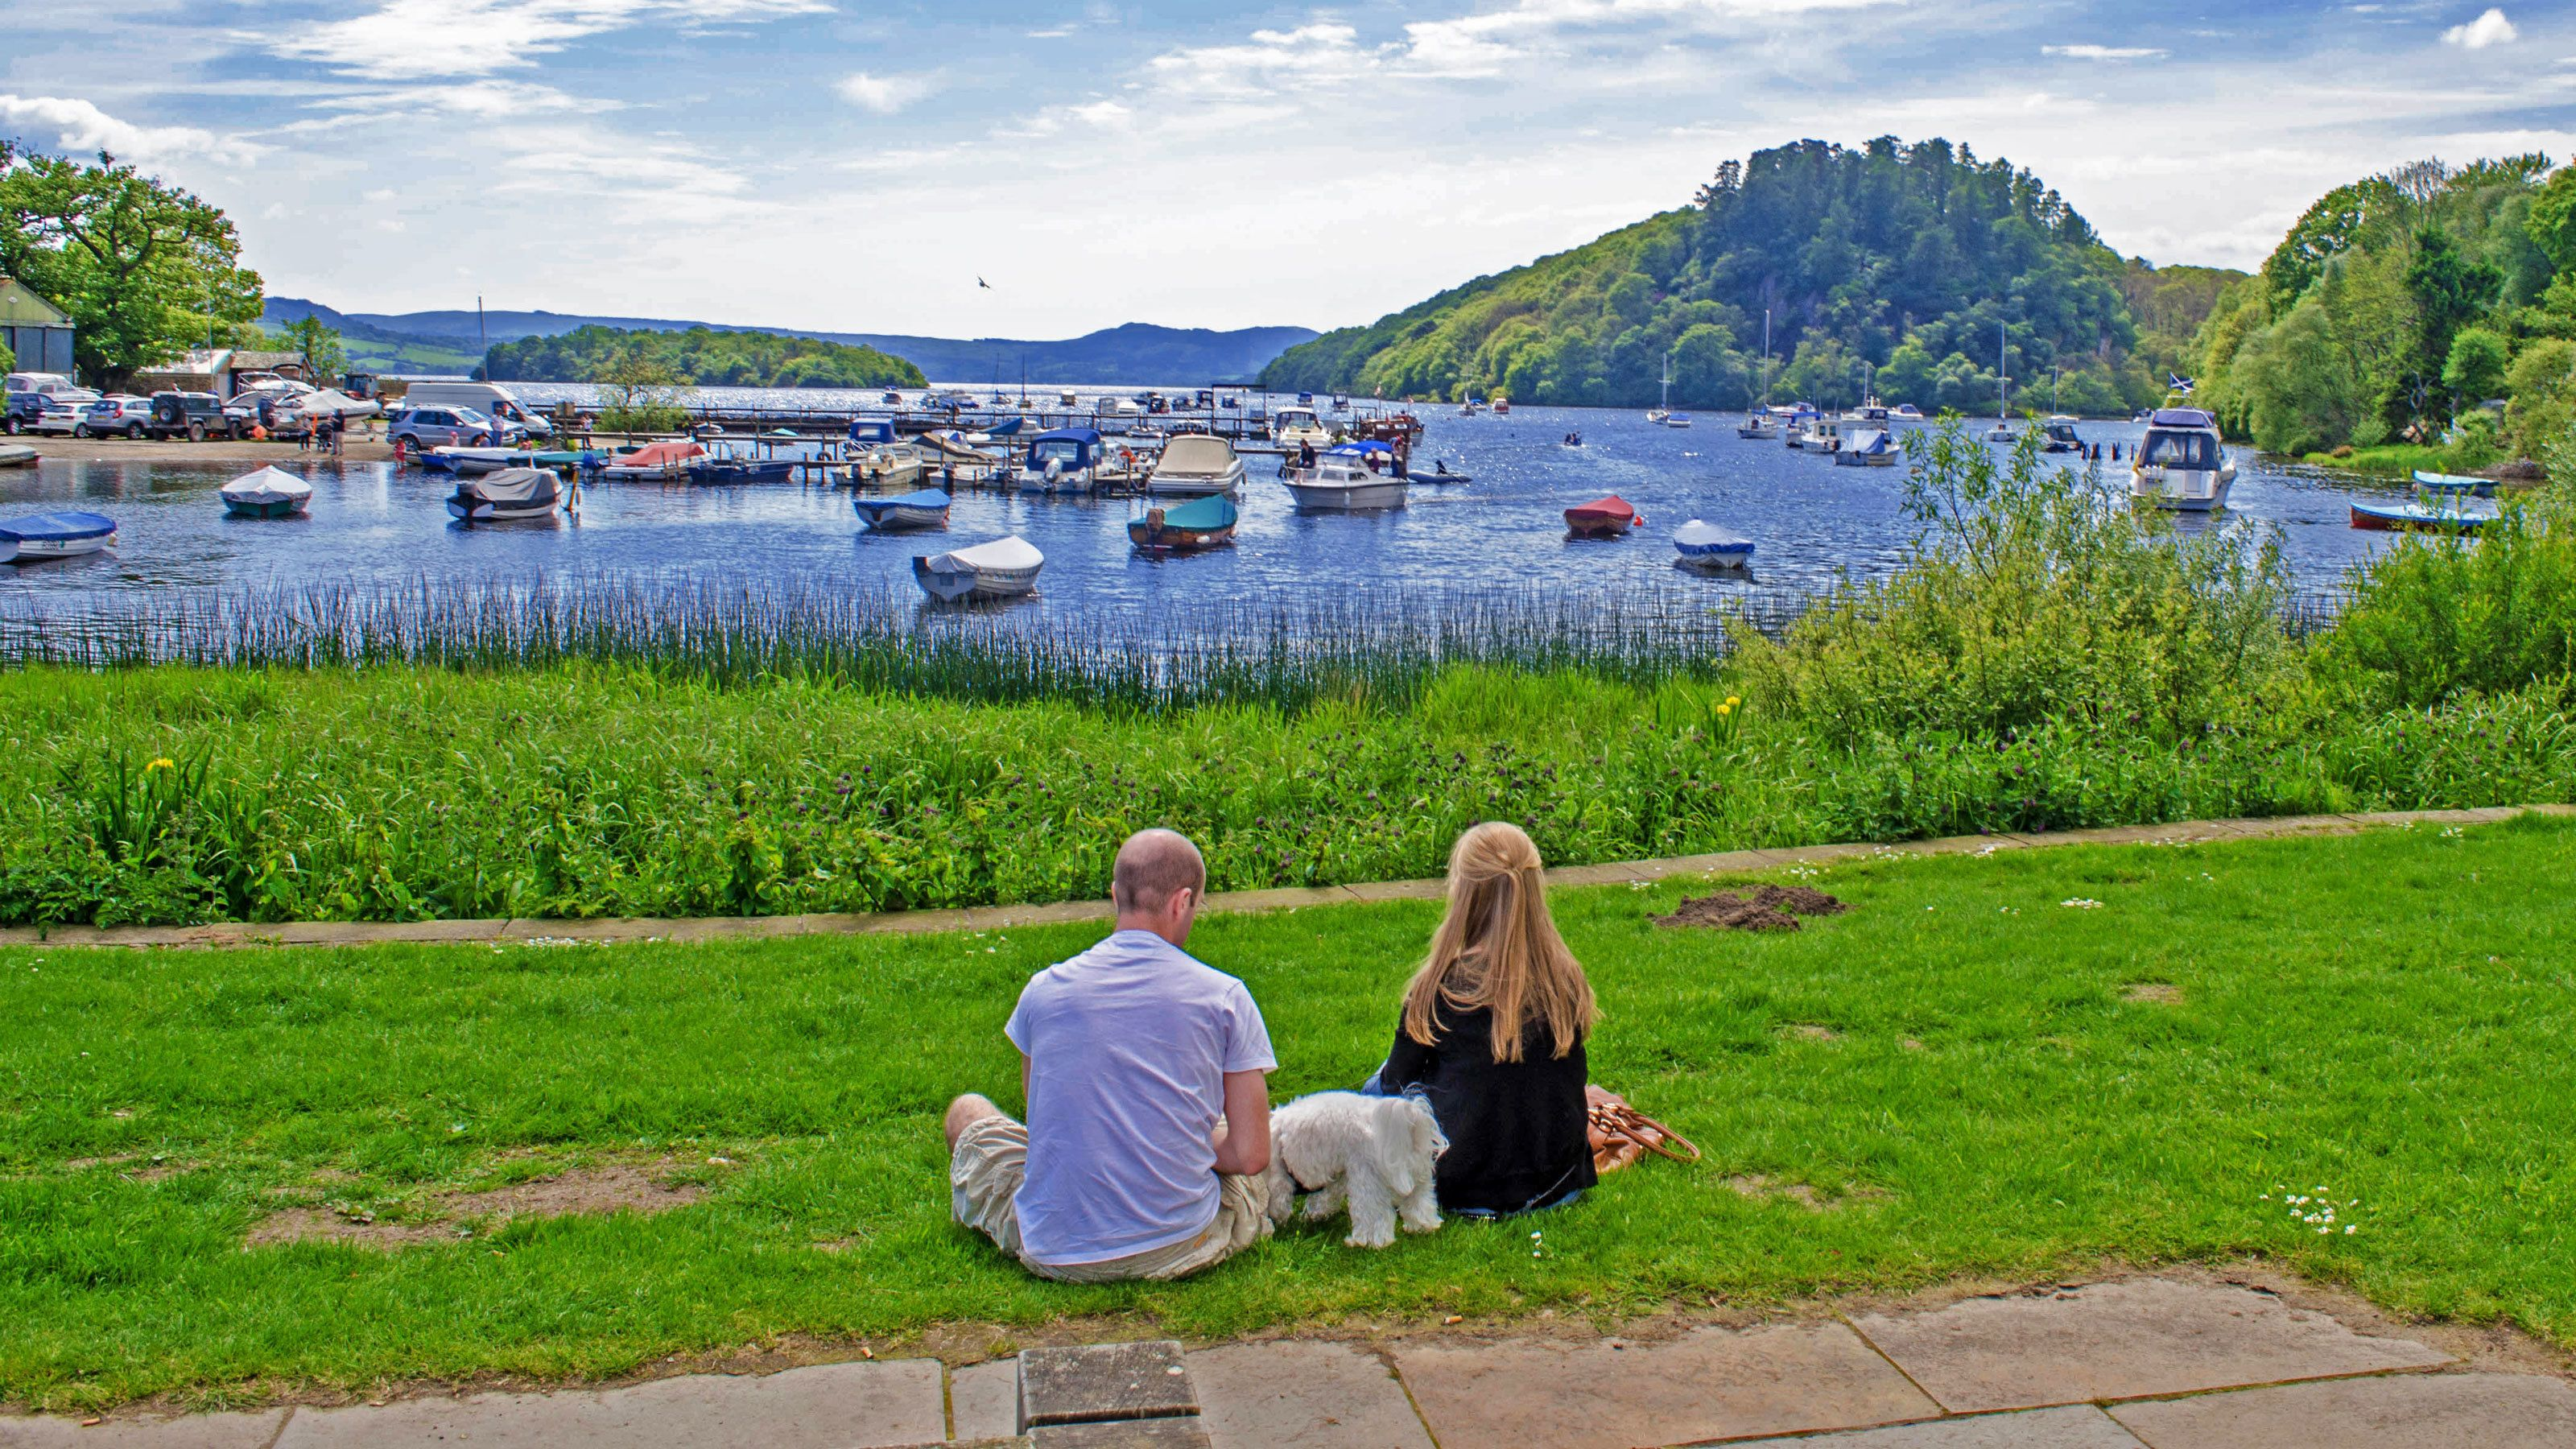 Loch Lomond, Loch Awe, Oban & Inveraray Full-Day Tour